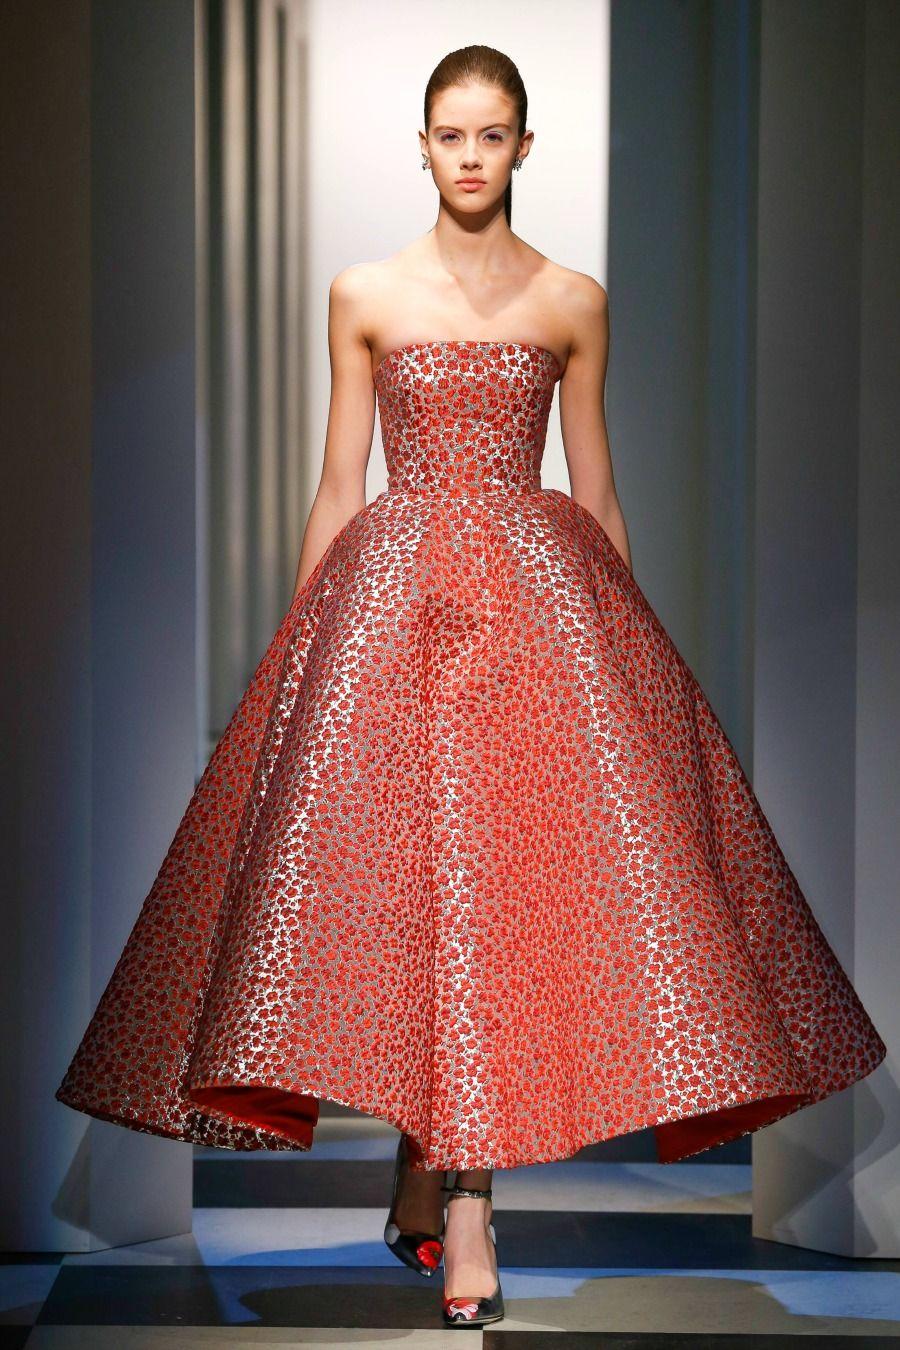 Oscar de la Renta Monse Debut at Fall 2017 Fashion Show | Oscar de ...